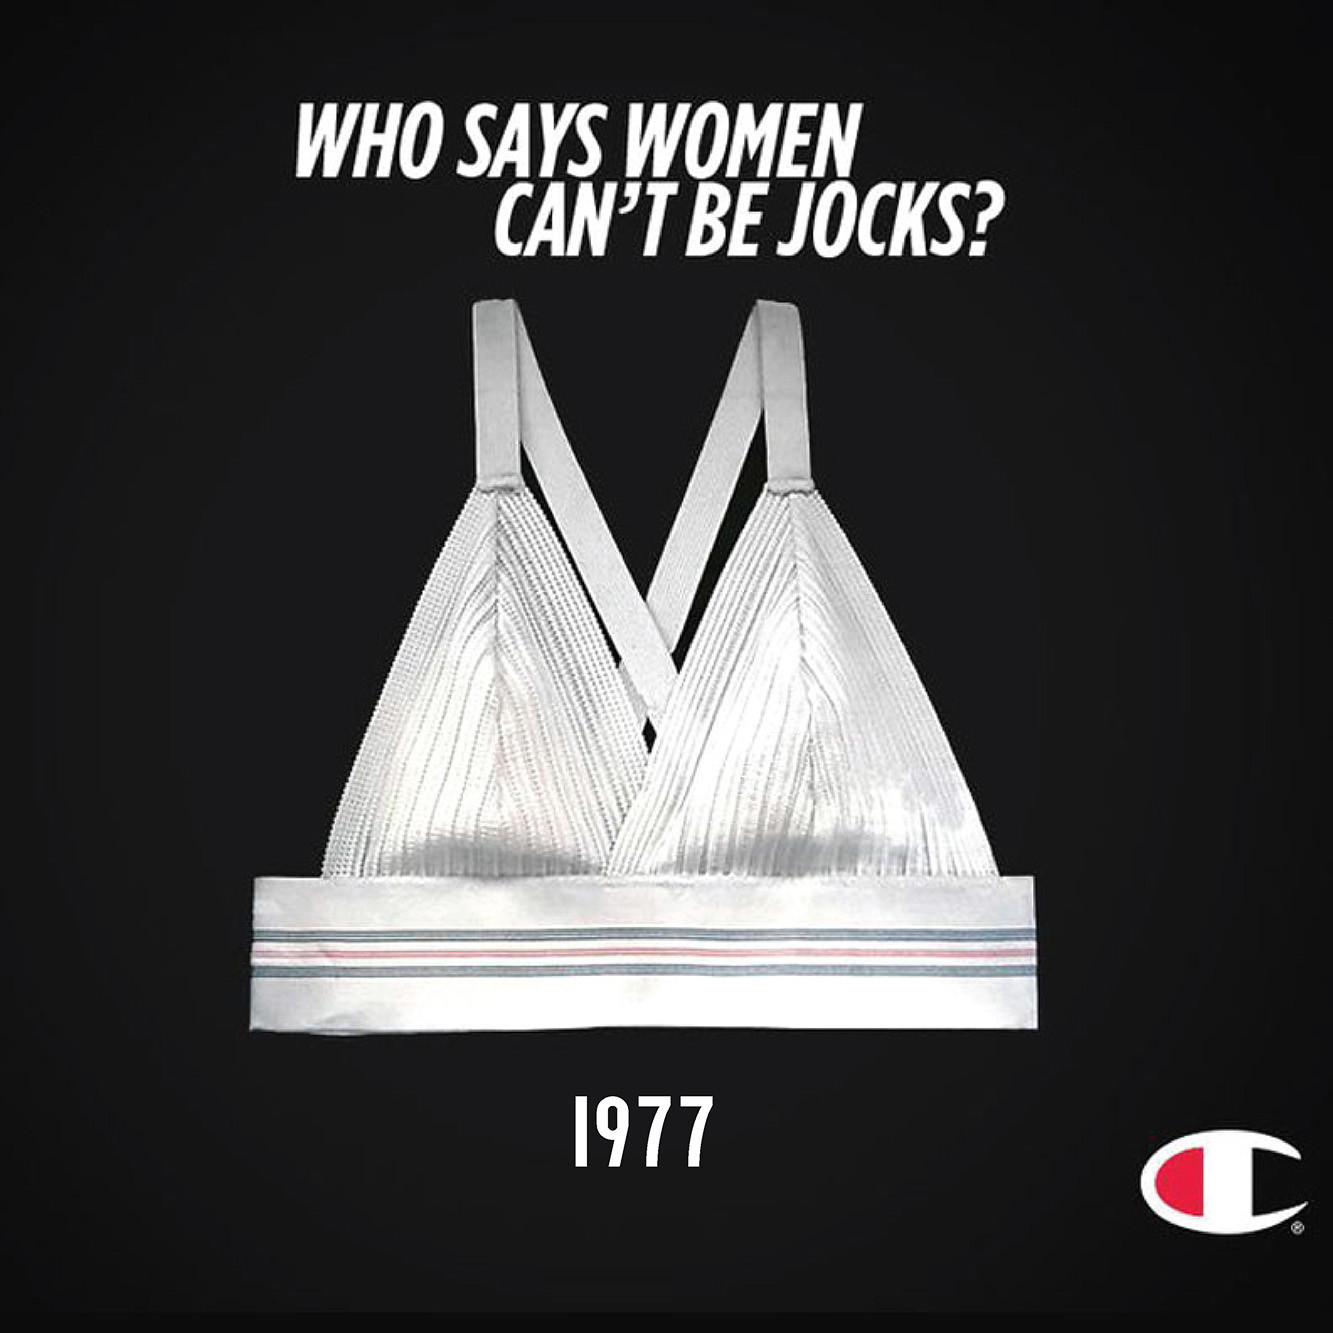 women-sports-bras-design.jpg